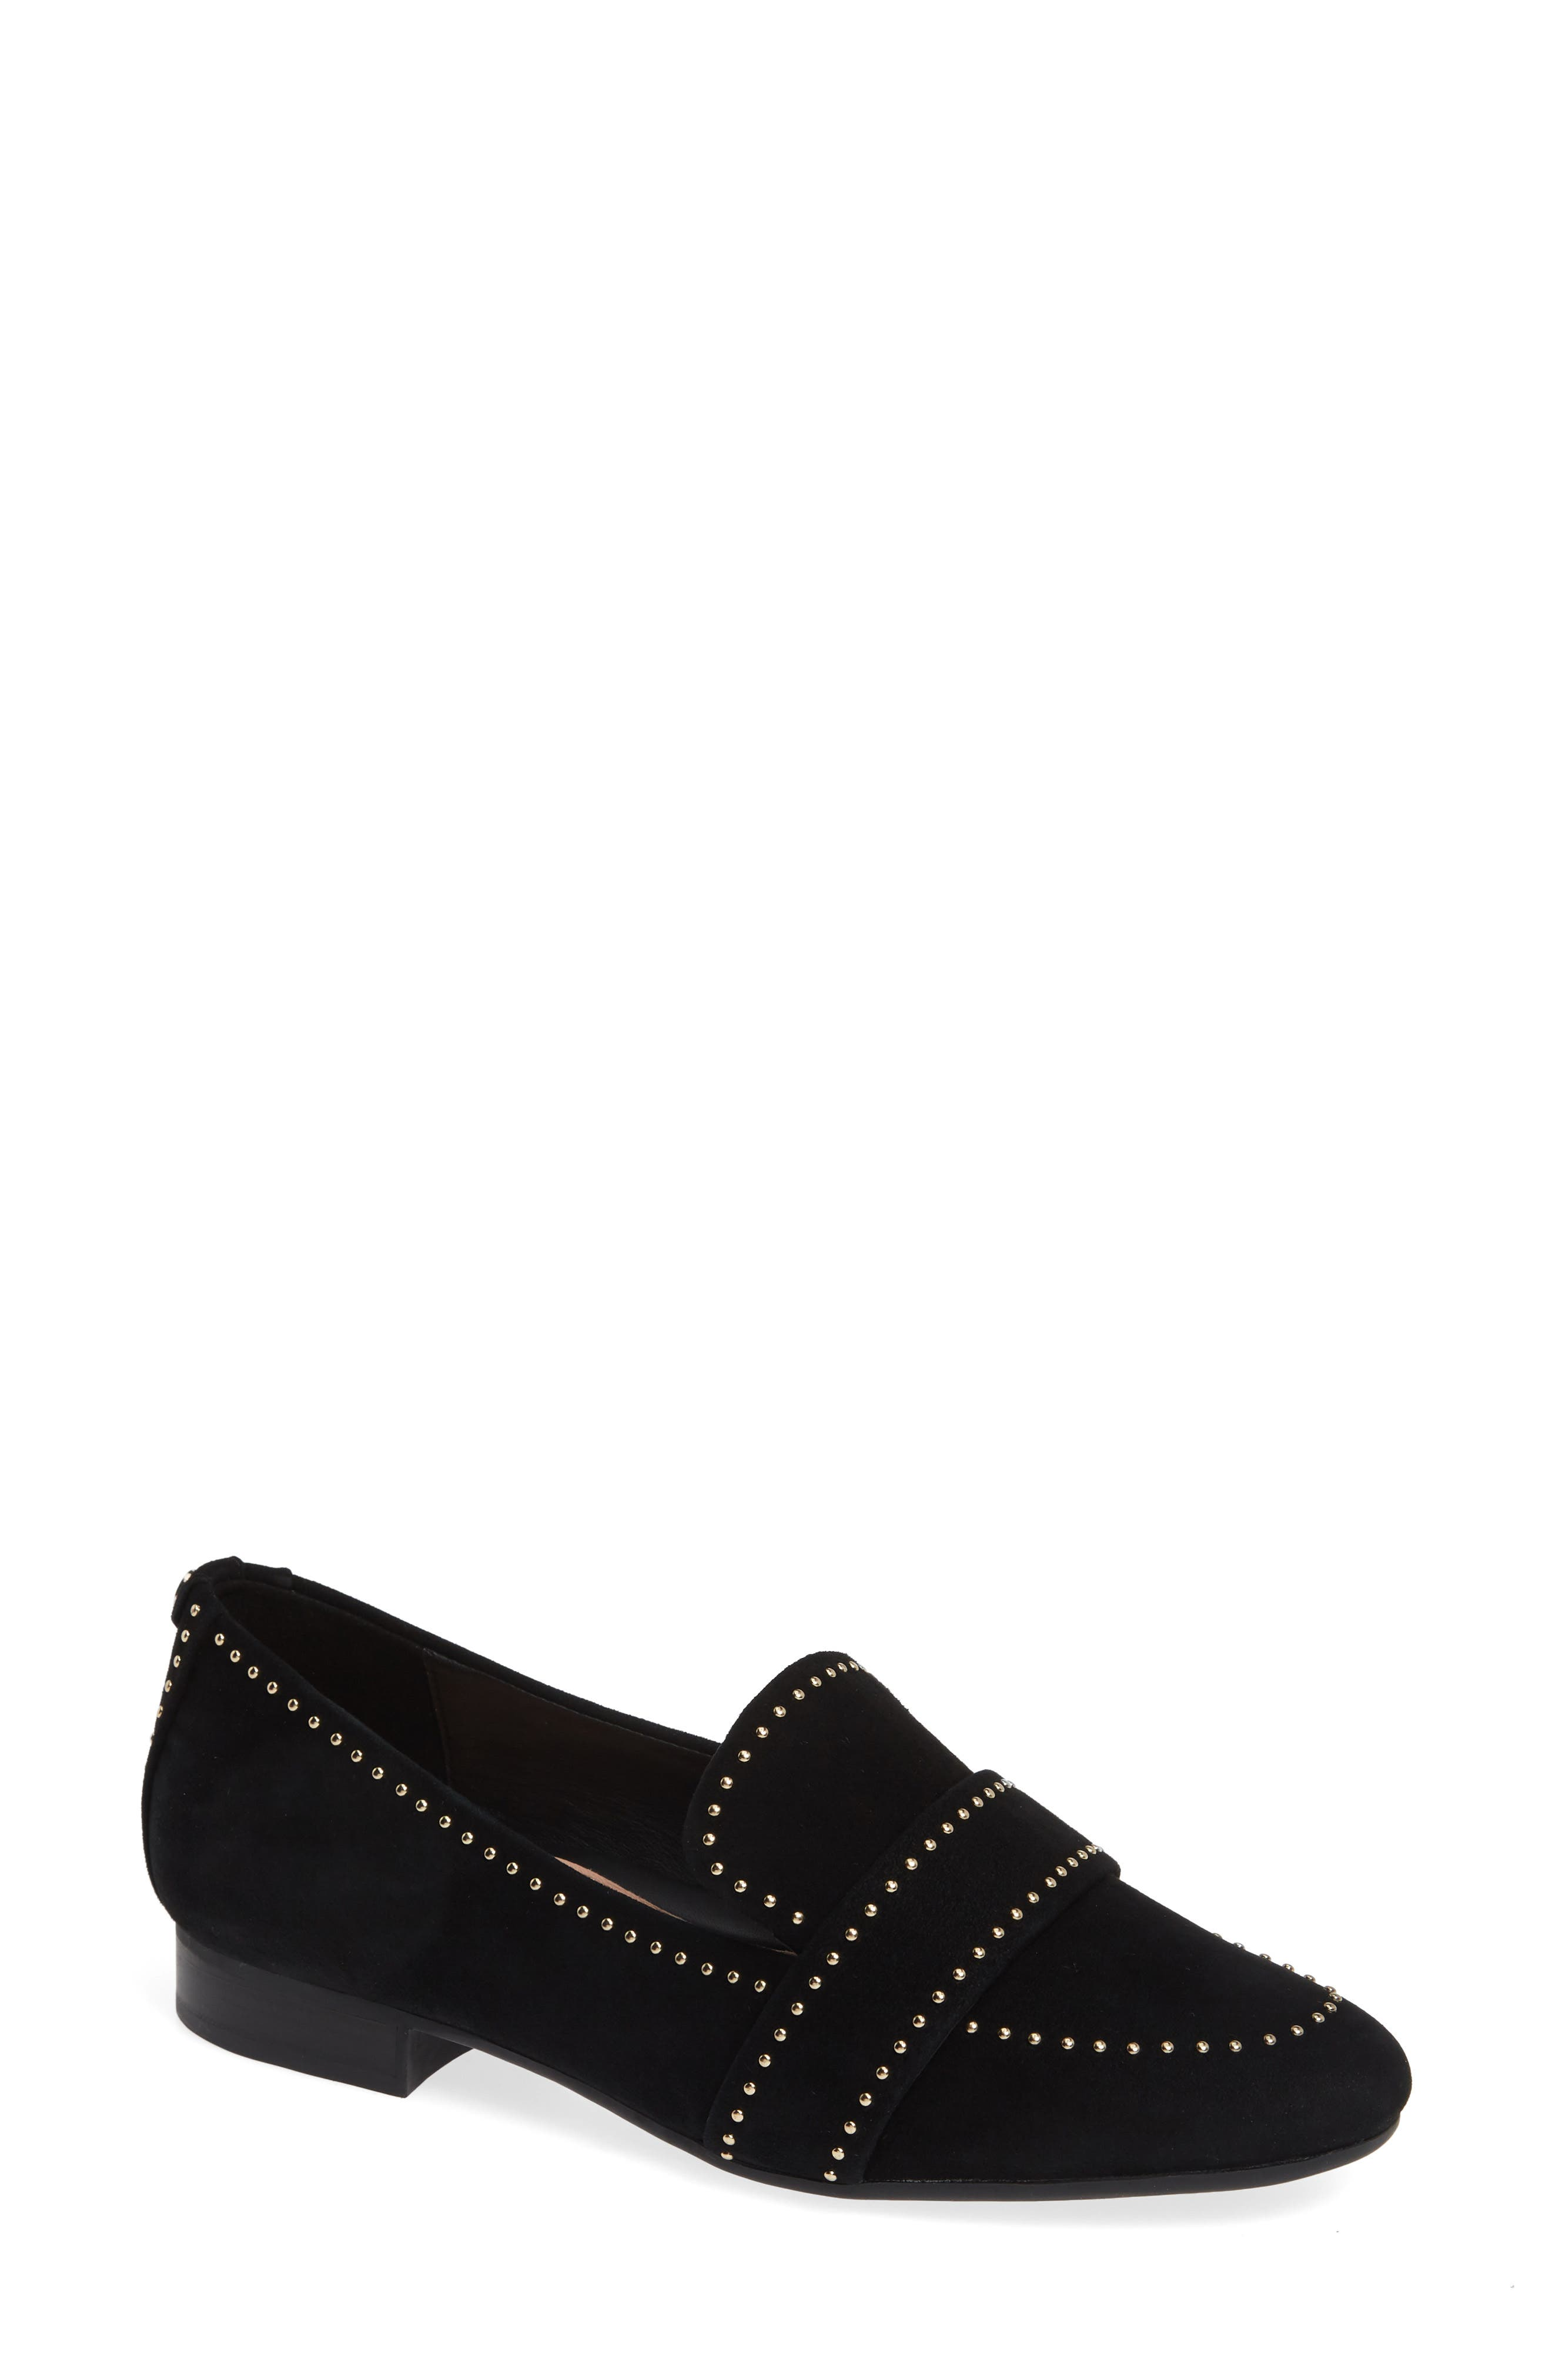 TARYN ROSE, Bristol Loafer, Main thumbnail 1, color, BLACK SUEDE